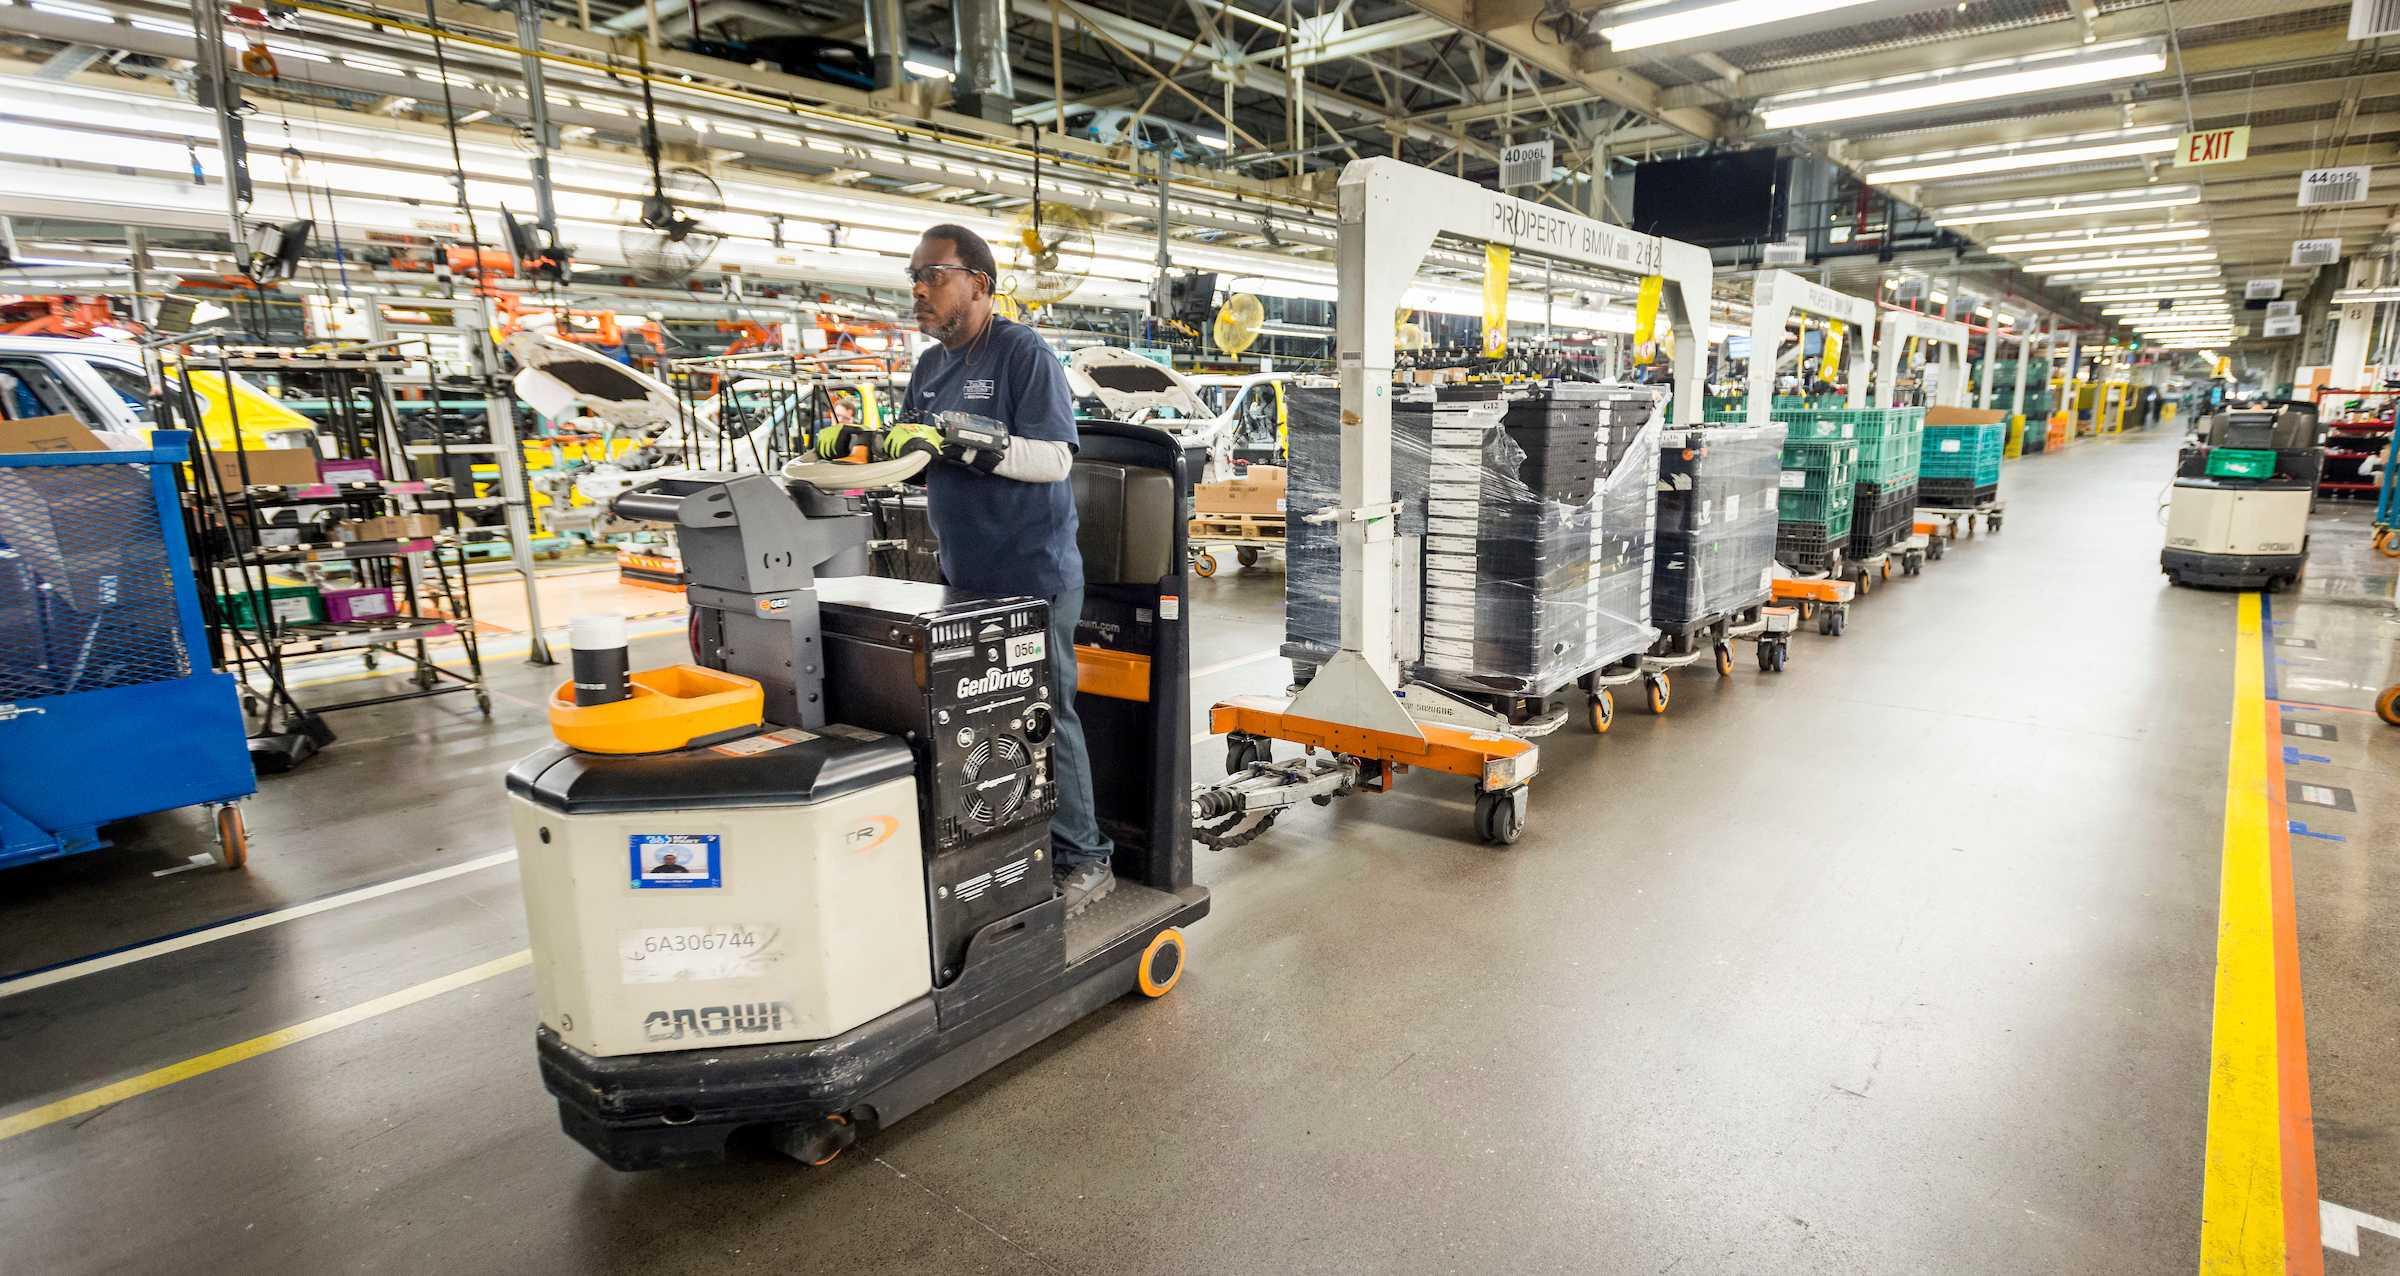 BMW Plant Spartanburg >> Bmw Group Plant Spartanburg Logistics 06 2017